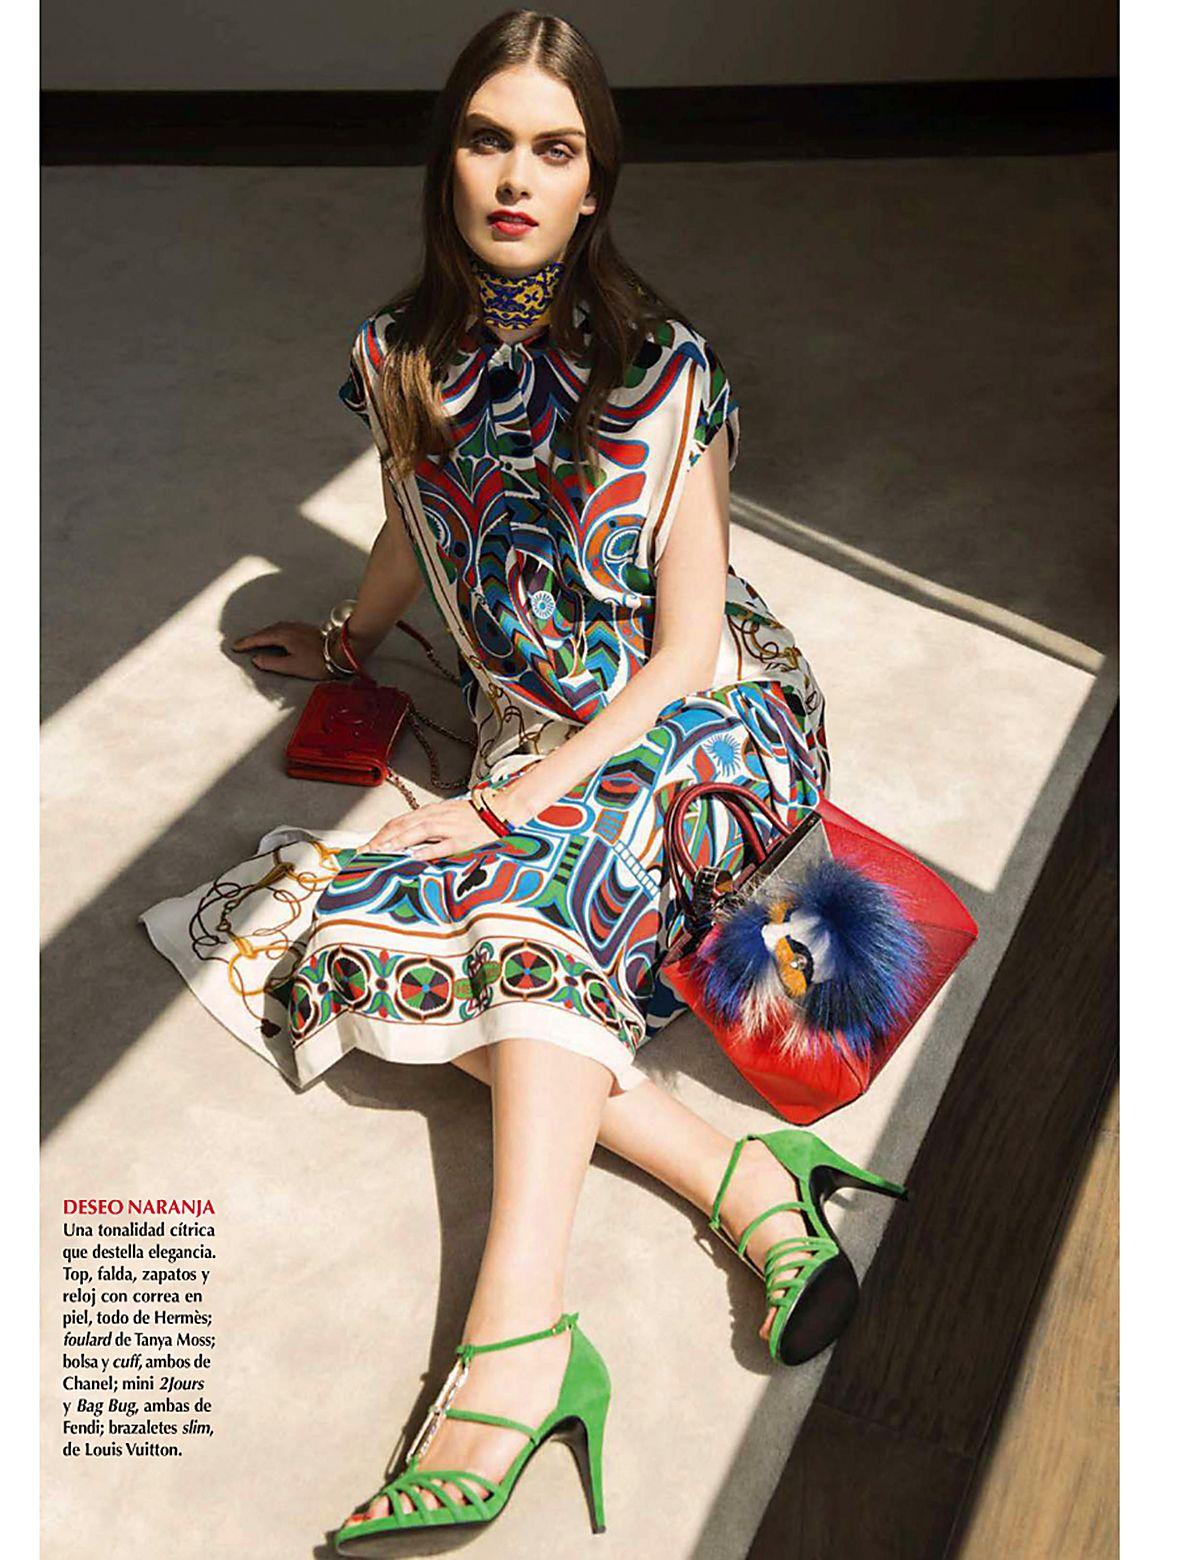 Hermes dress -  Maria Palm By Alexander Neumann For Vogue Mexico April 2014